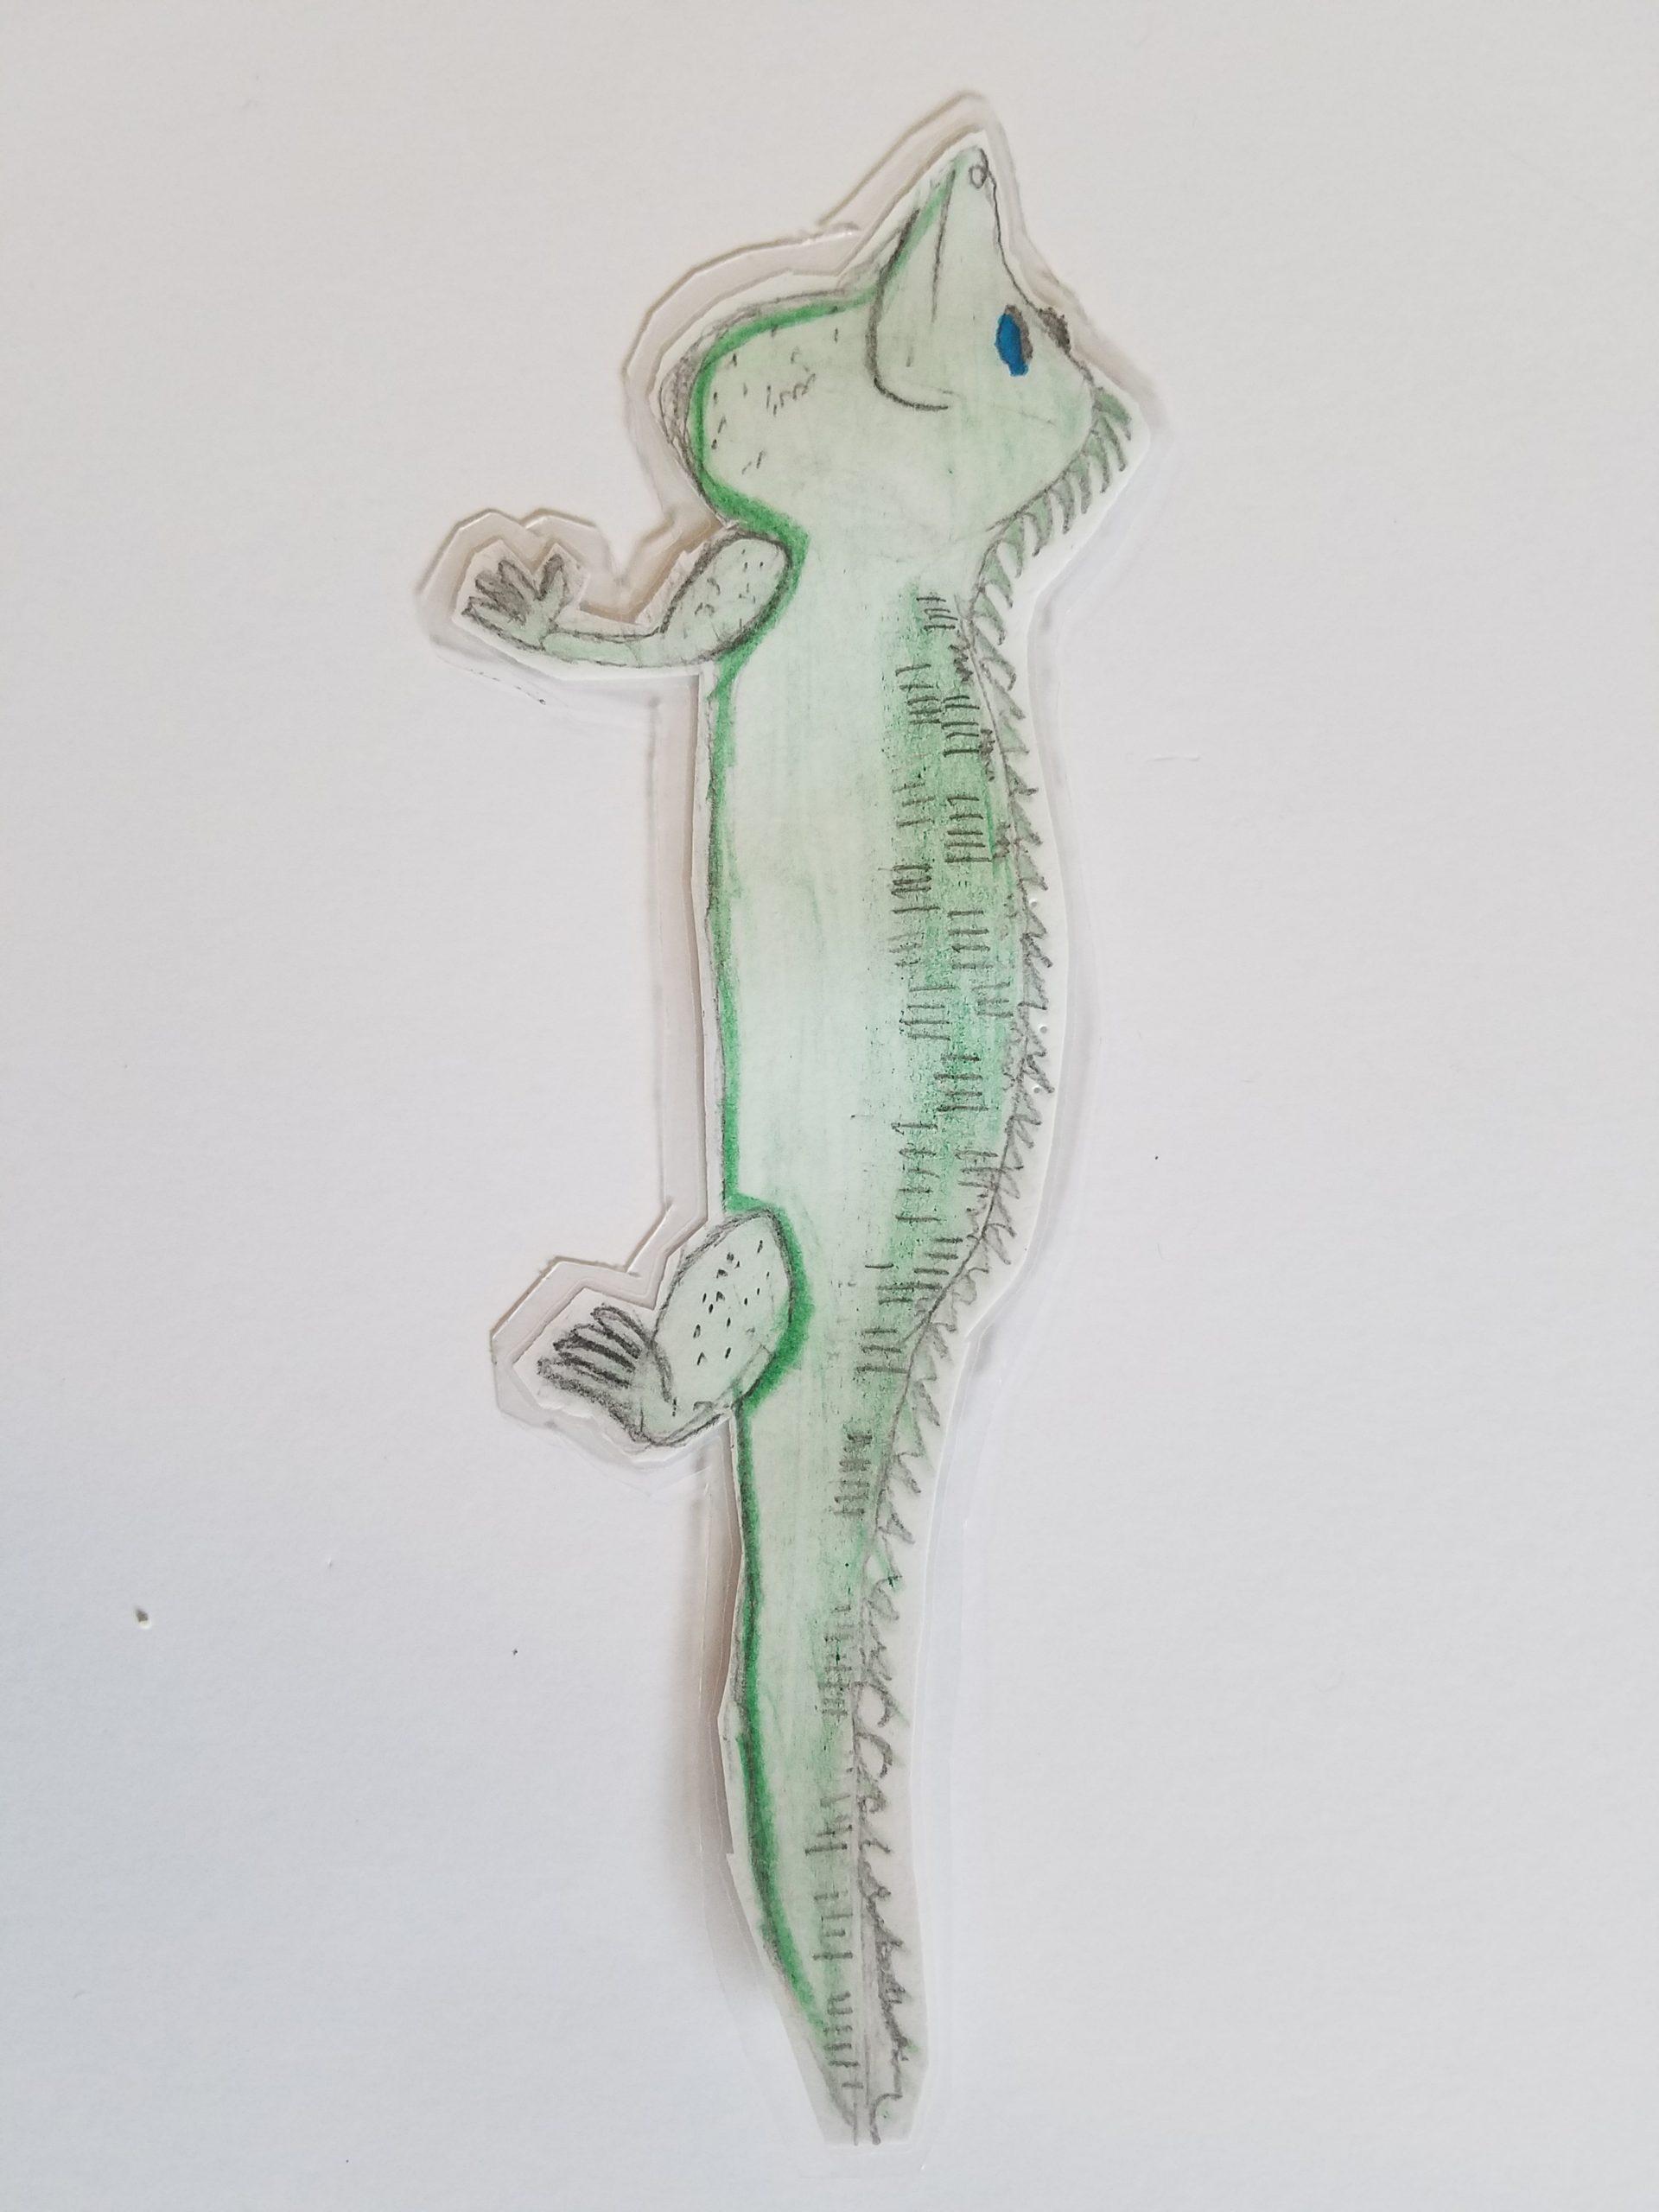 YAC 2020 #31 5-8 chameleon